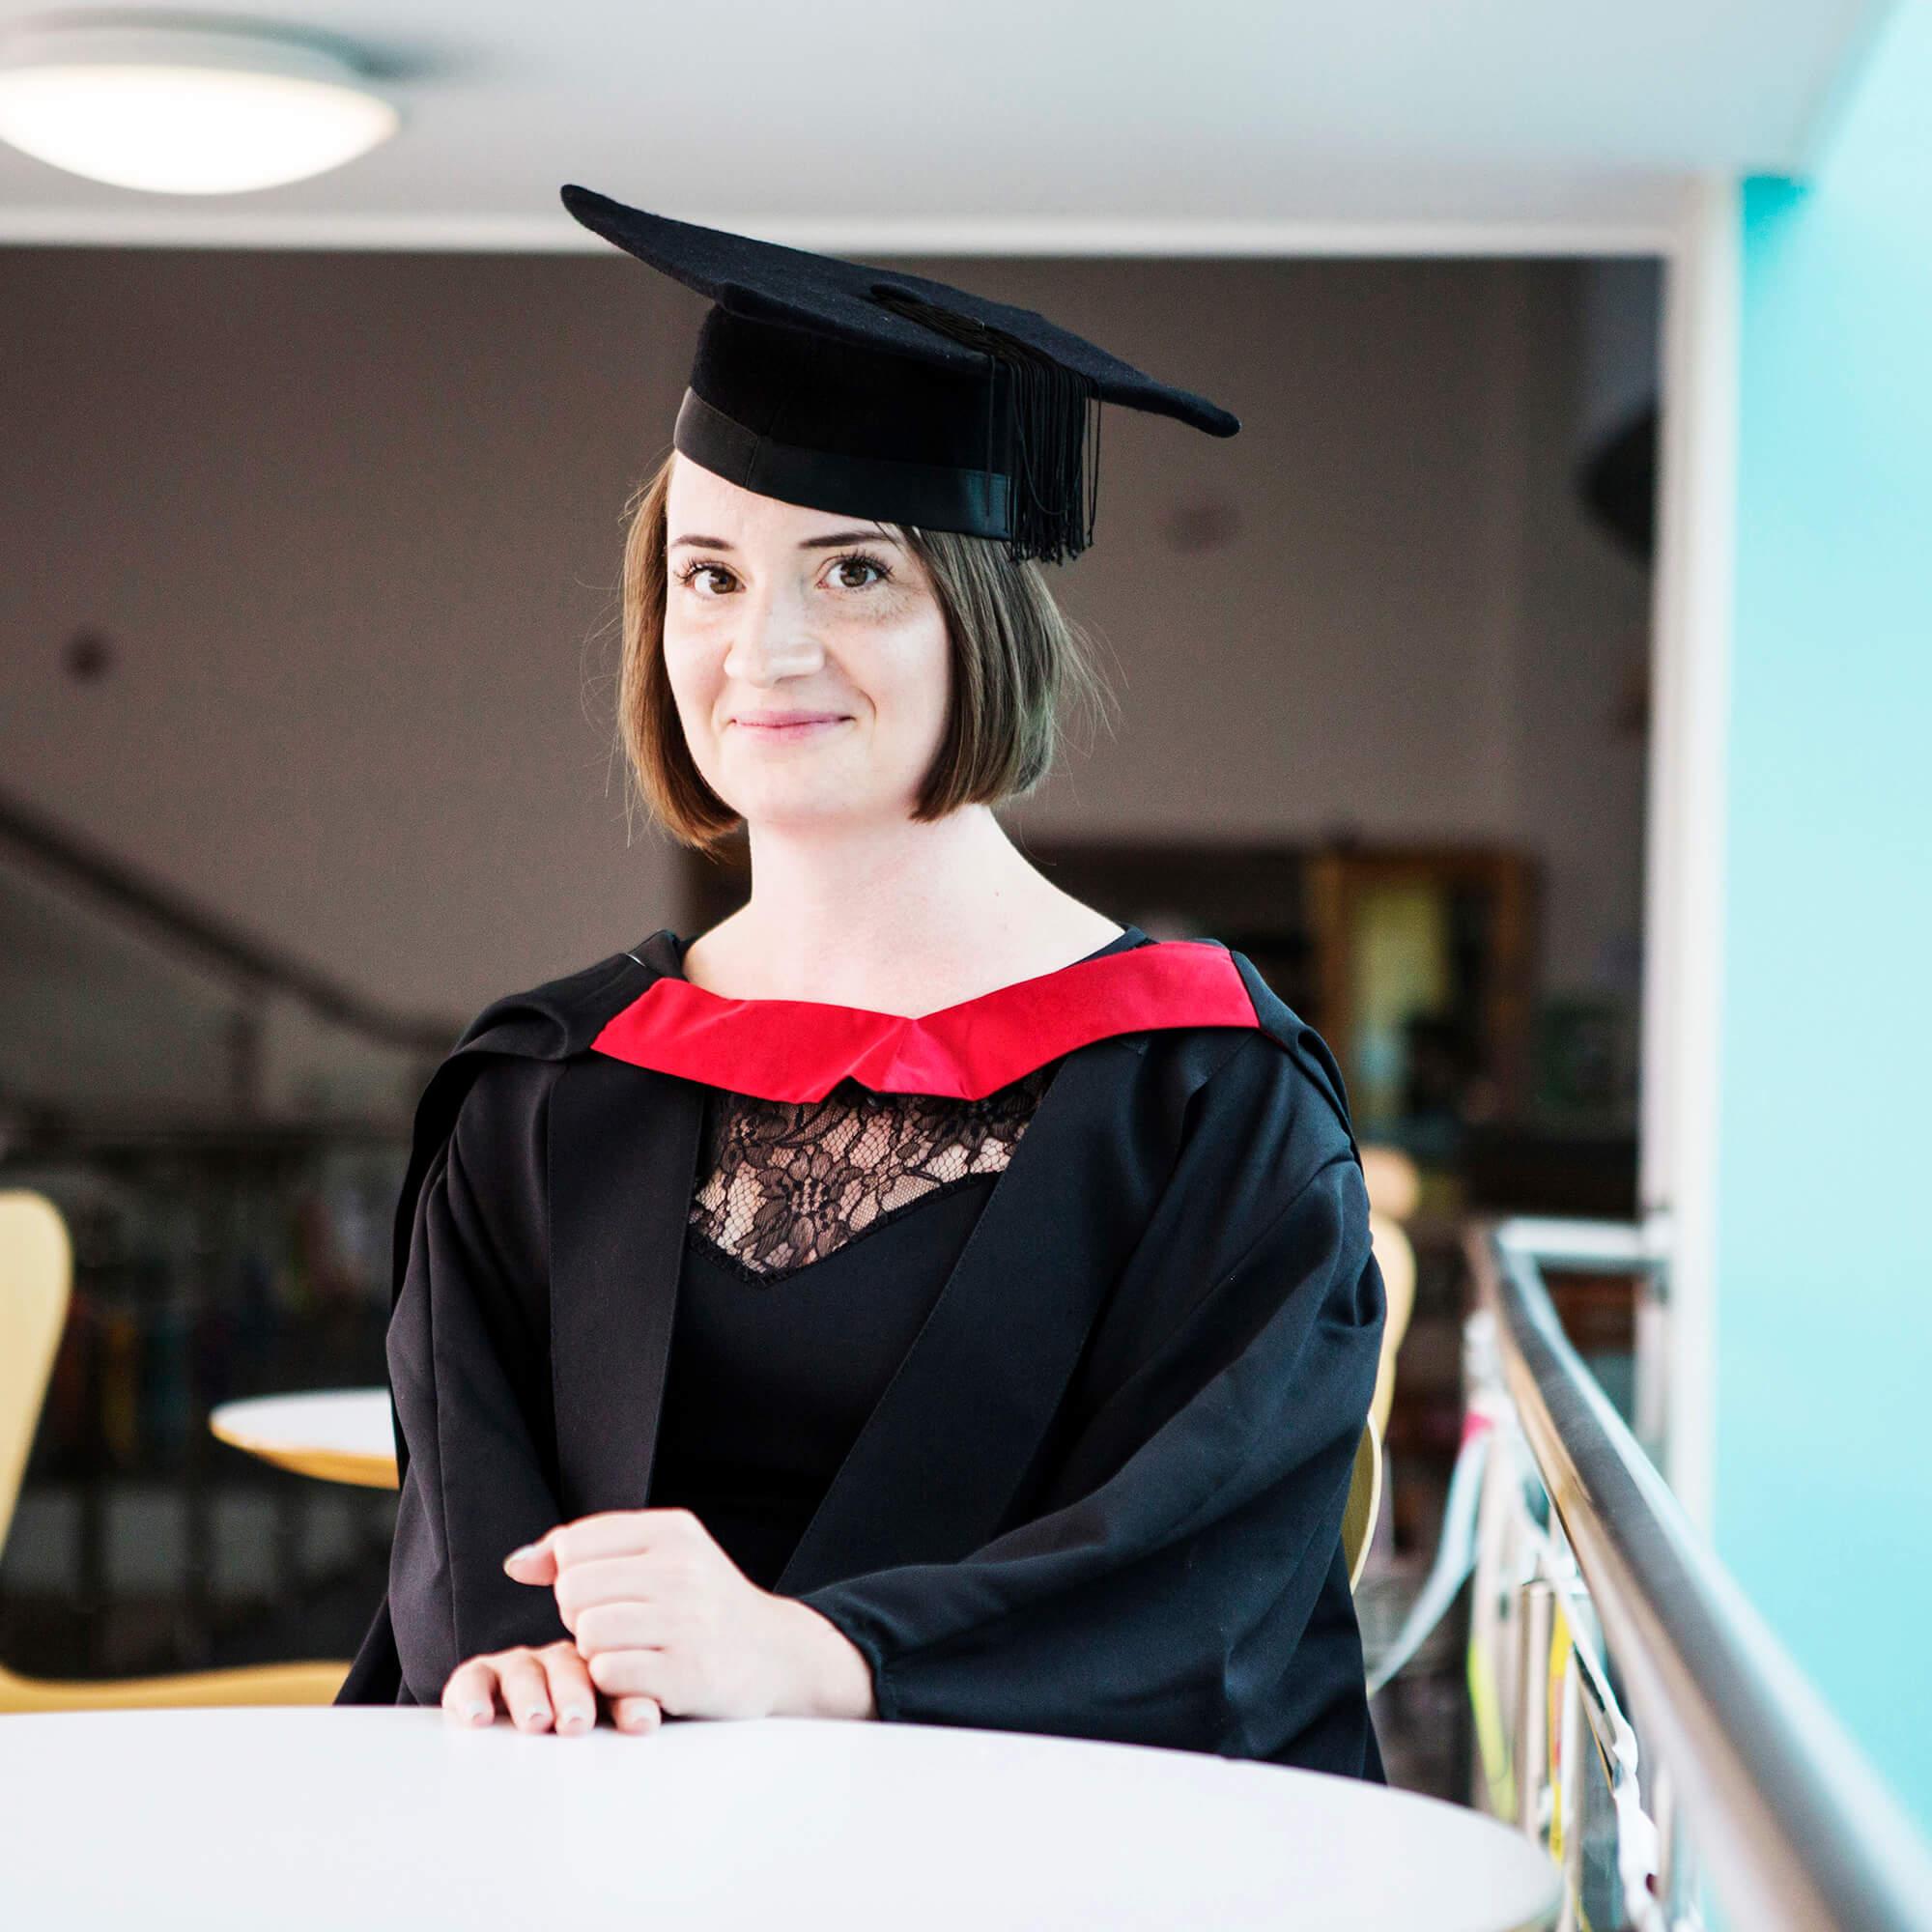 Kelly Davies at her graduation